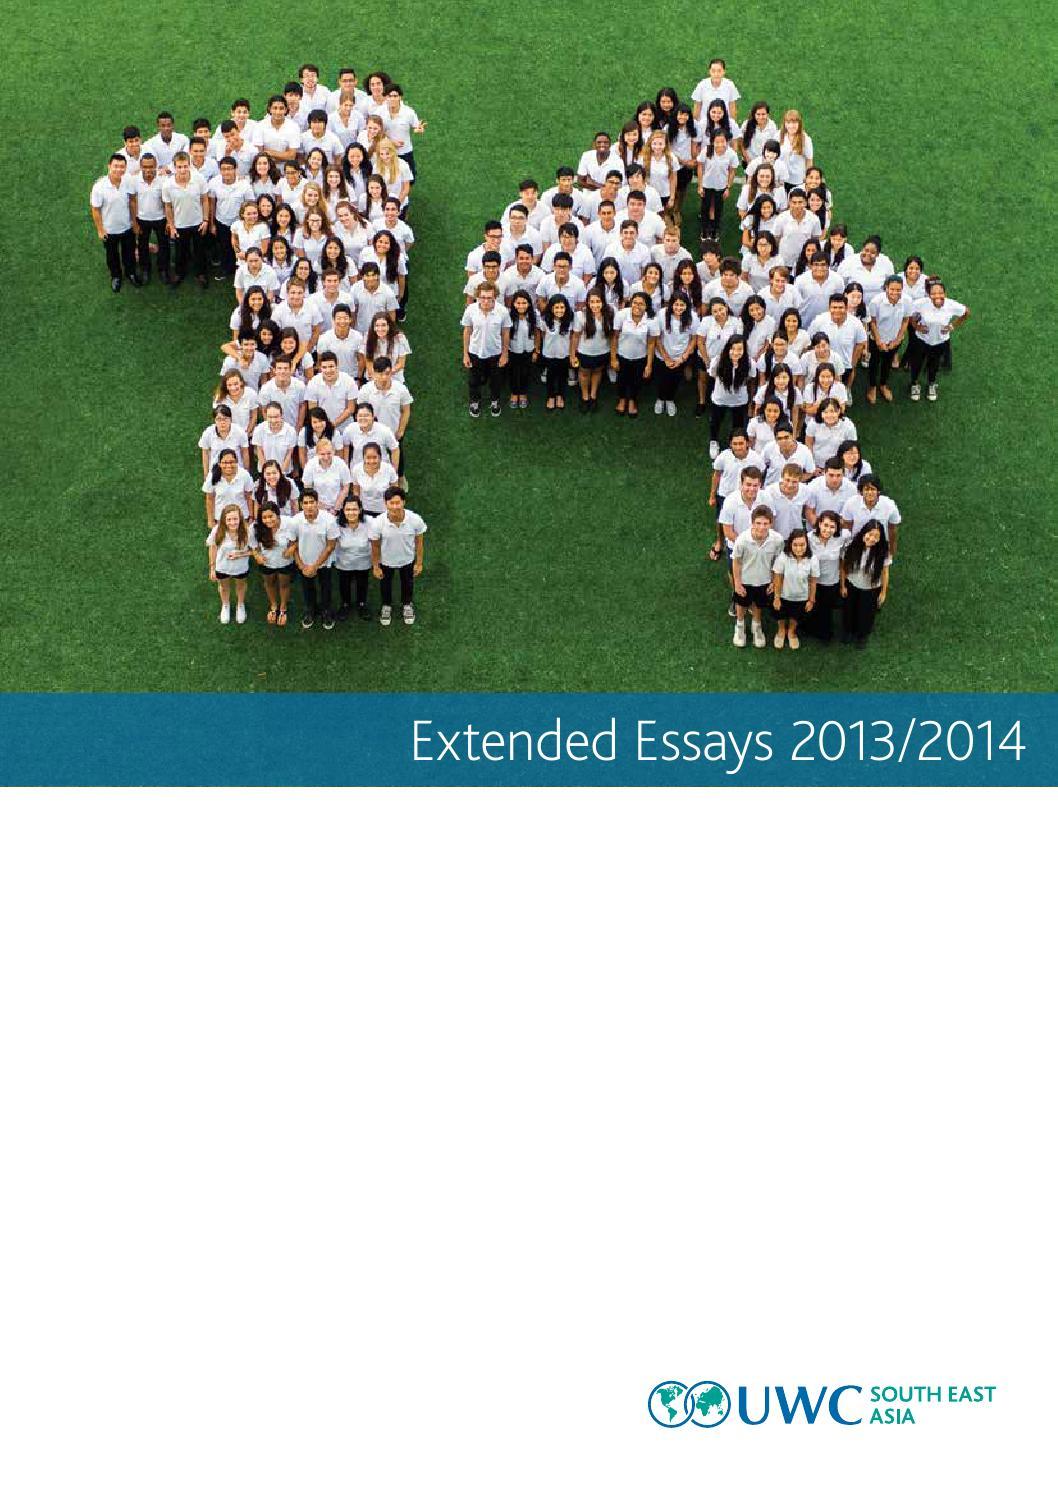 d795bb68633 UWCSEA East extended essays by uwcsea - issuu